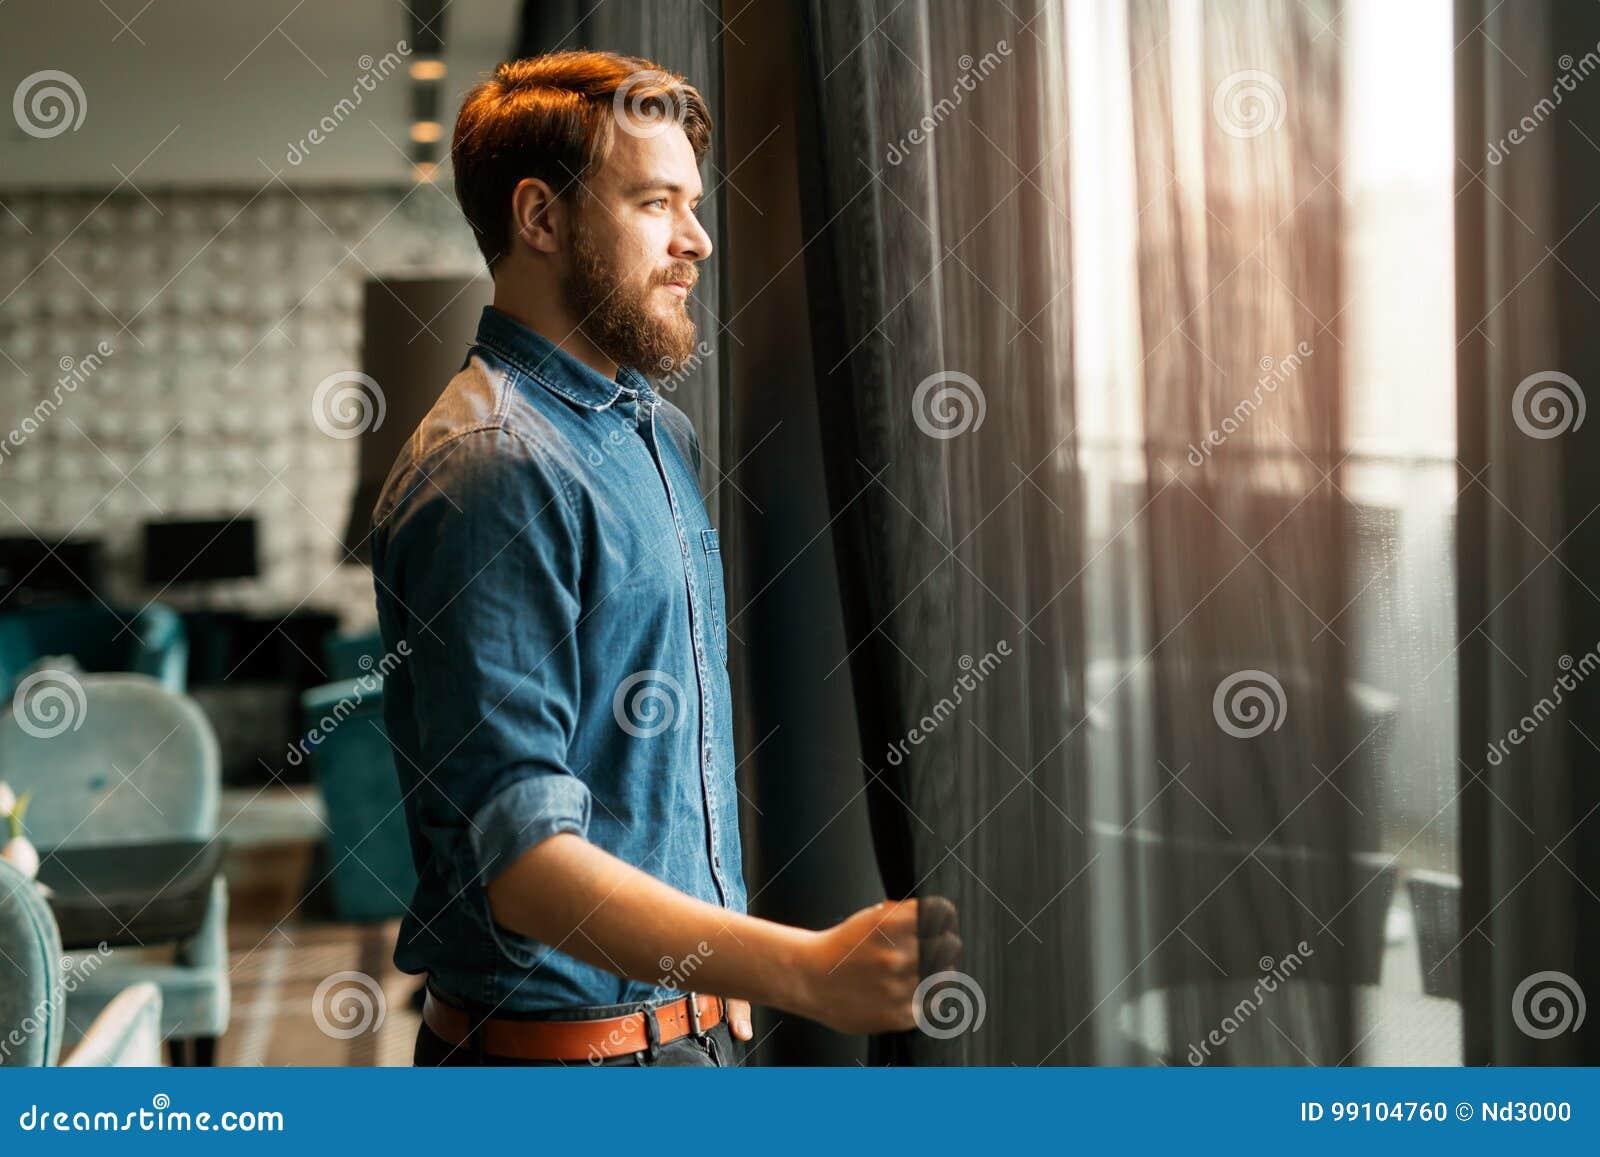 Homme bel regardant le paysage urbain